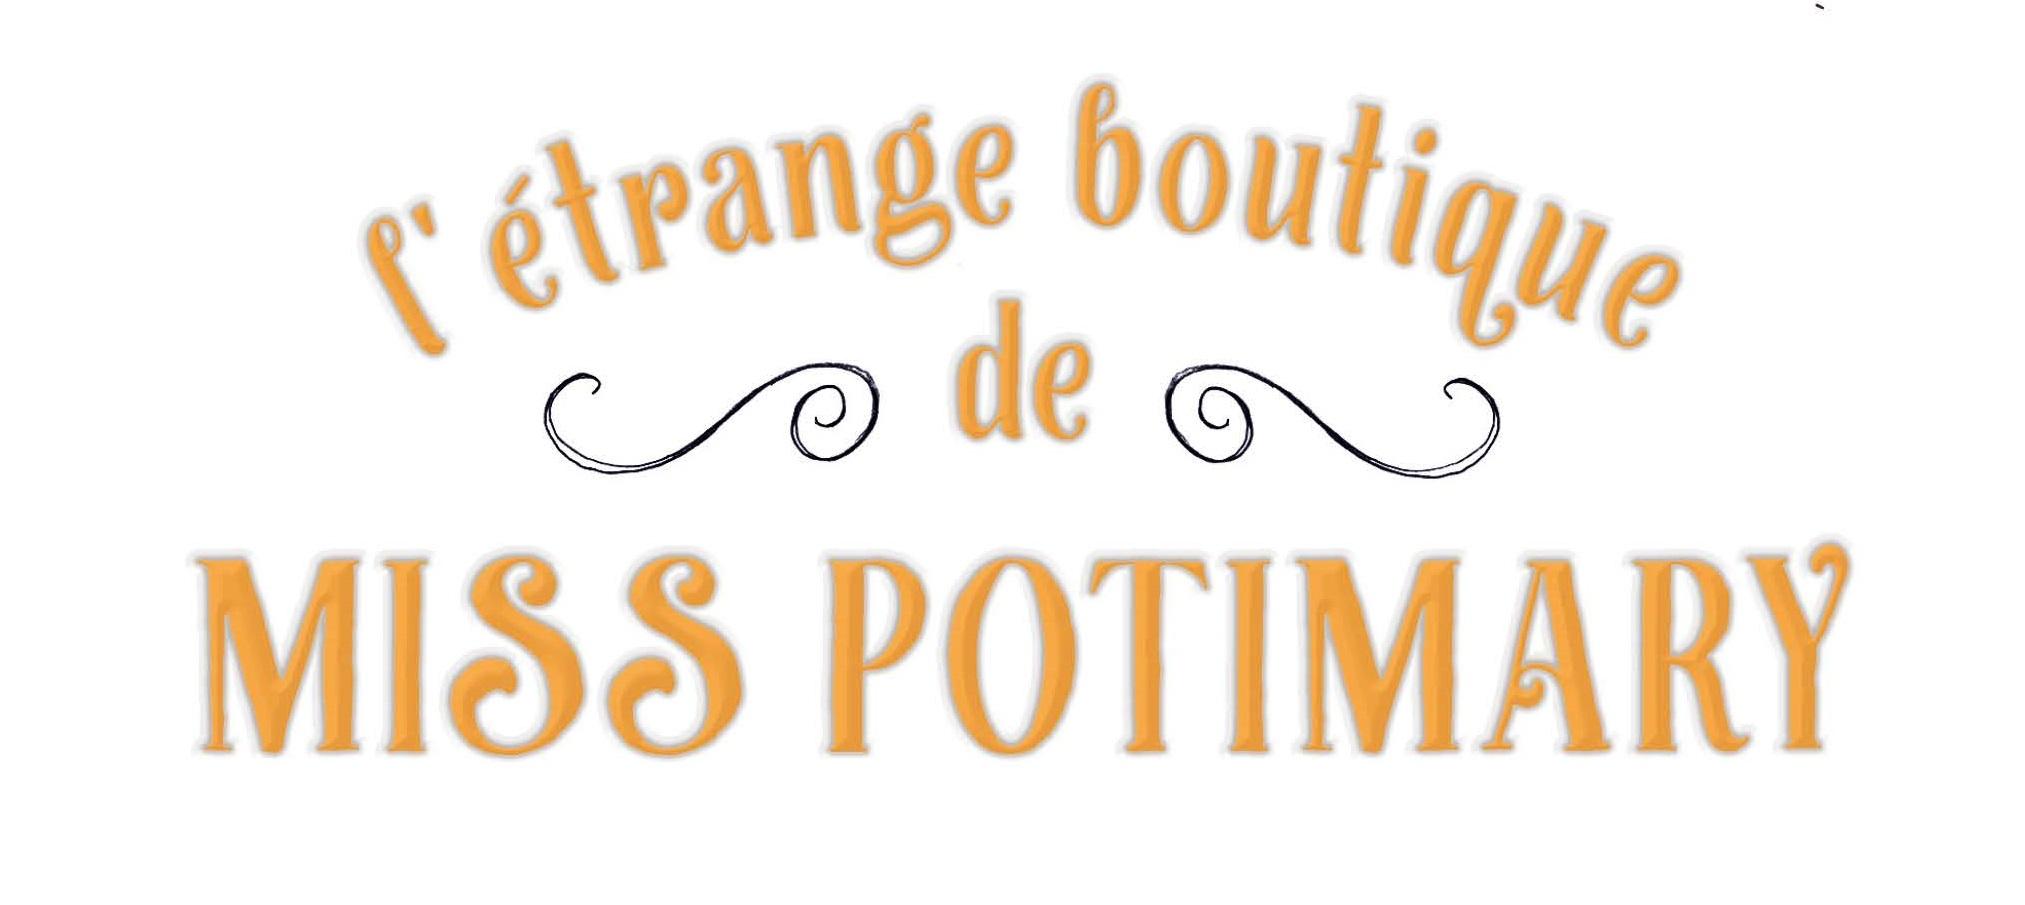 Miss Potimary logo